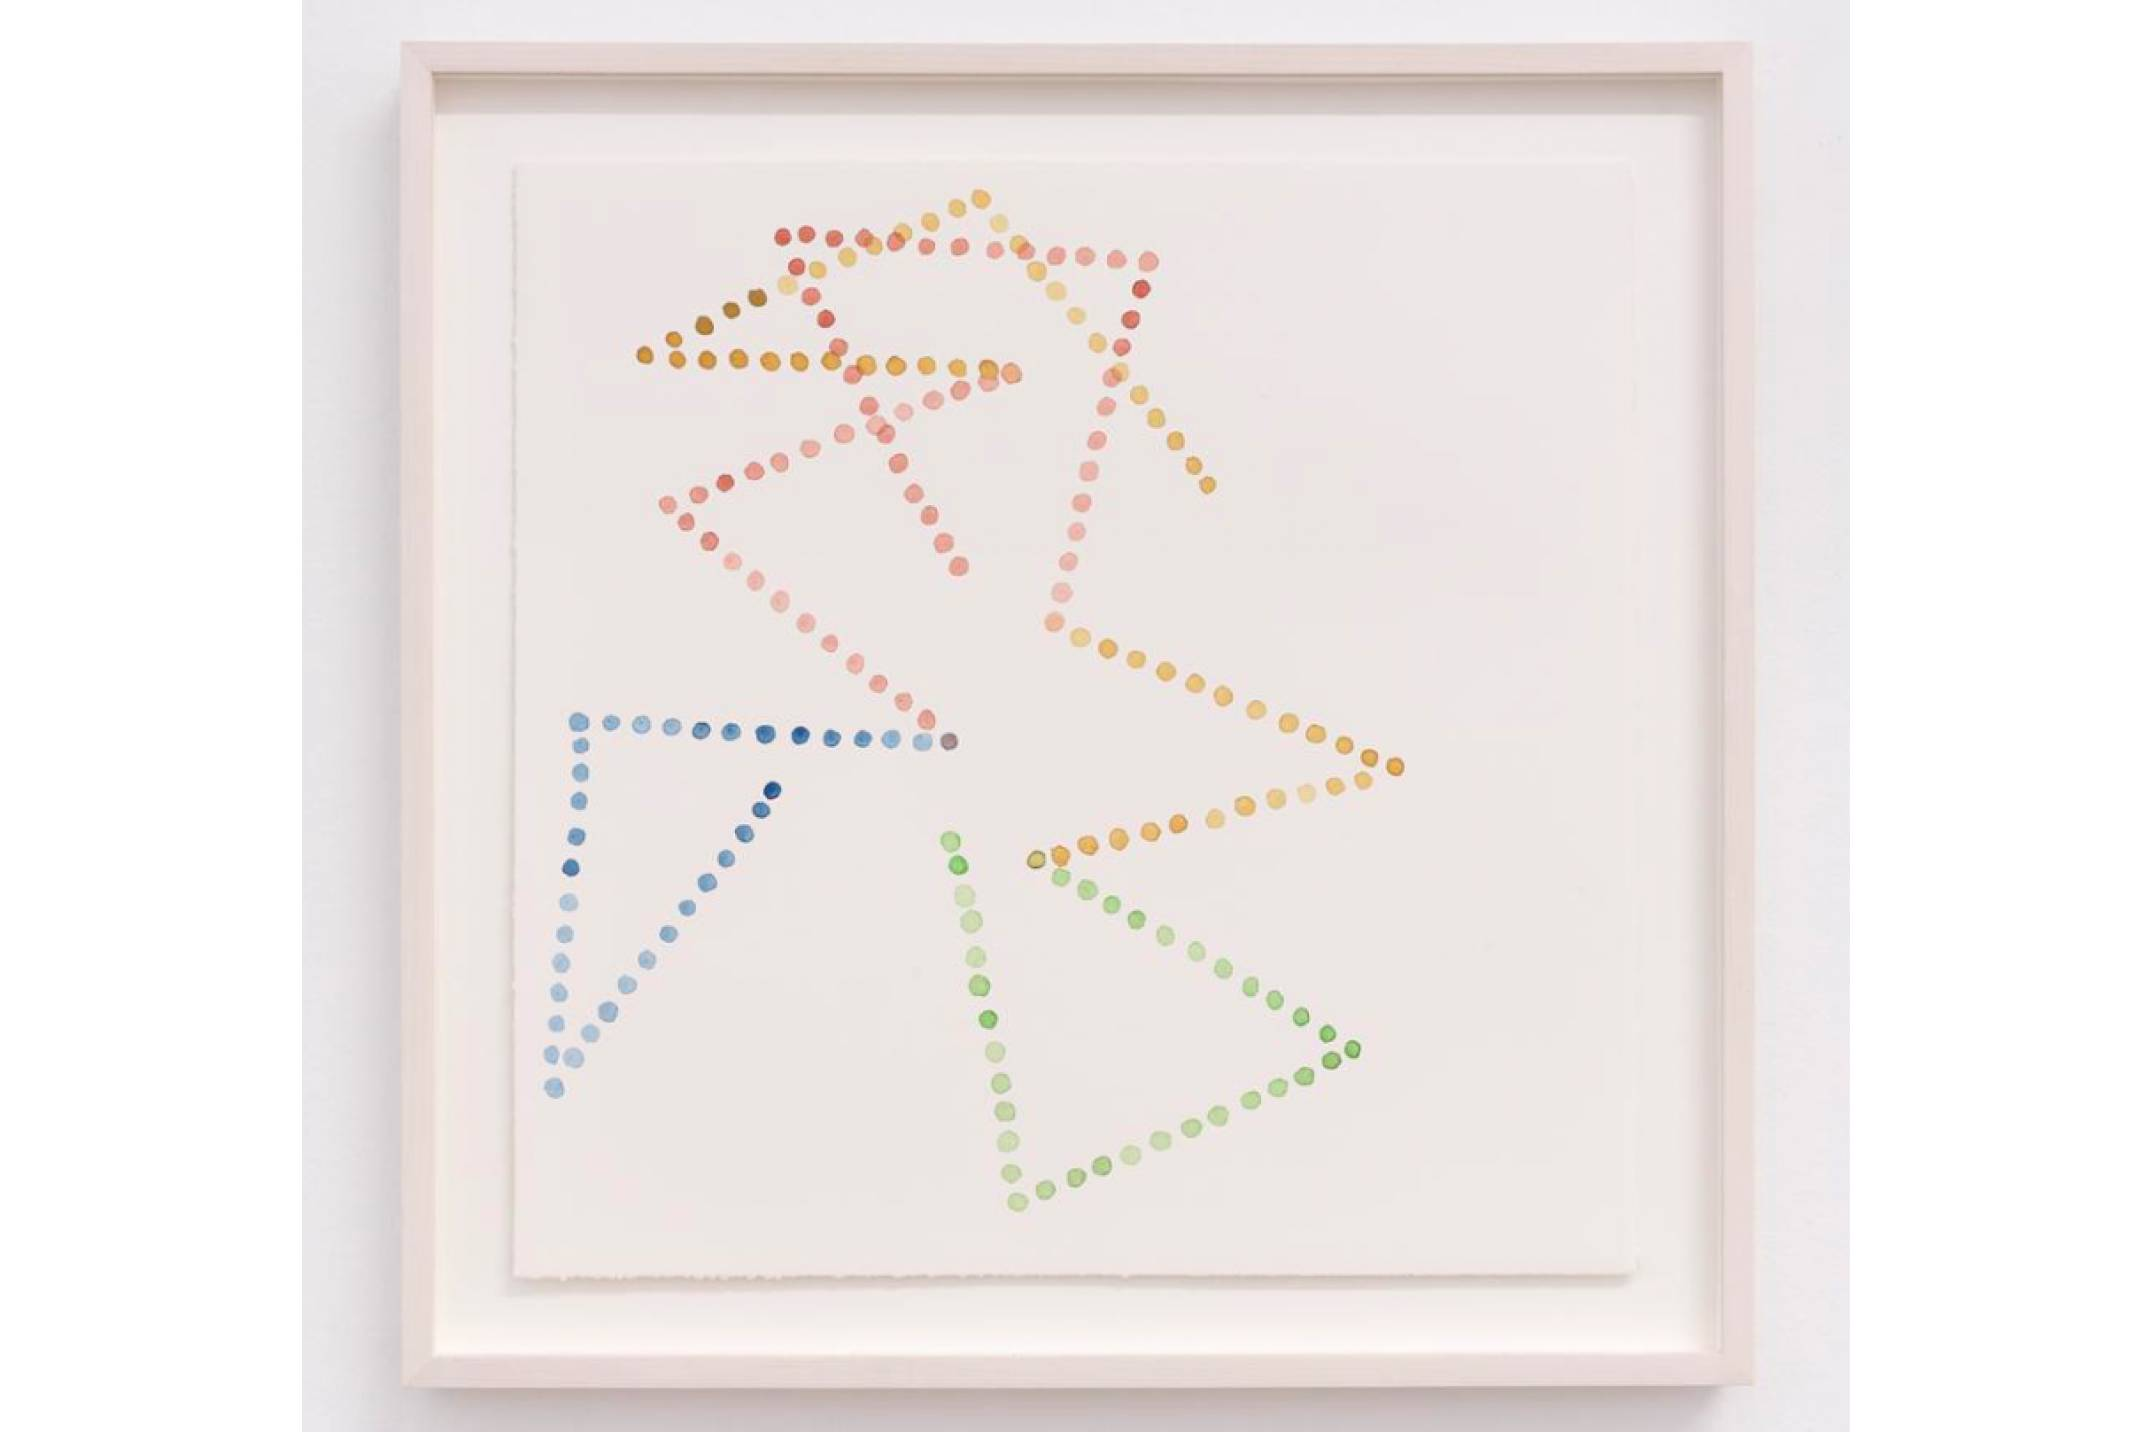 Mariana Castillo Deball, <em>Tonalamatl II</em>, 2017, watercolor on paper, 35 × 35 cm - Mendes Wood DM